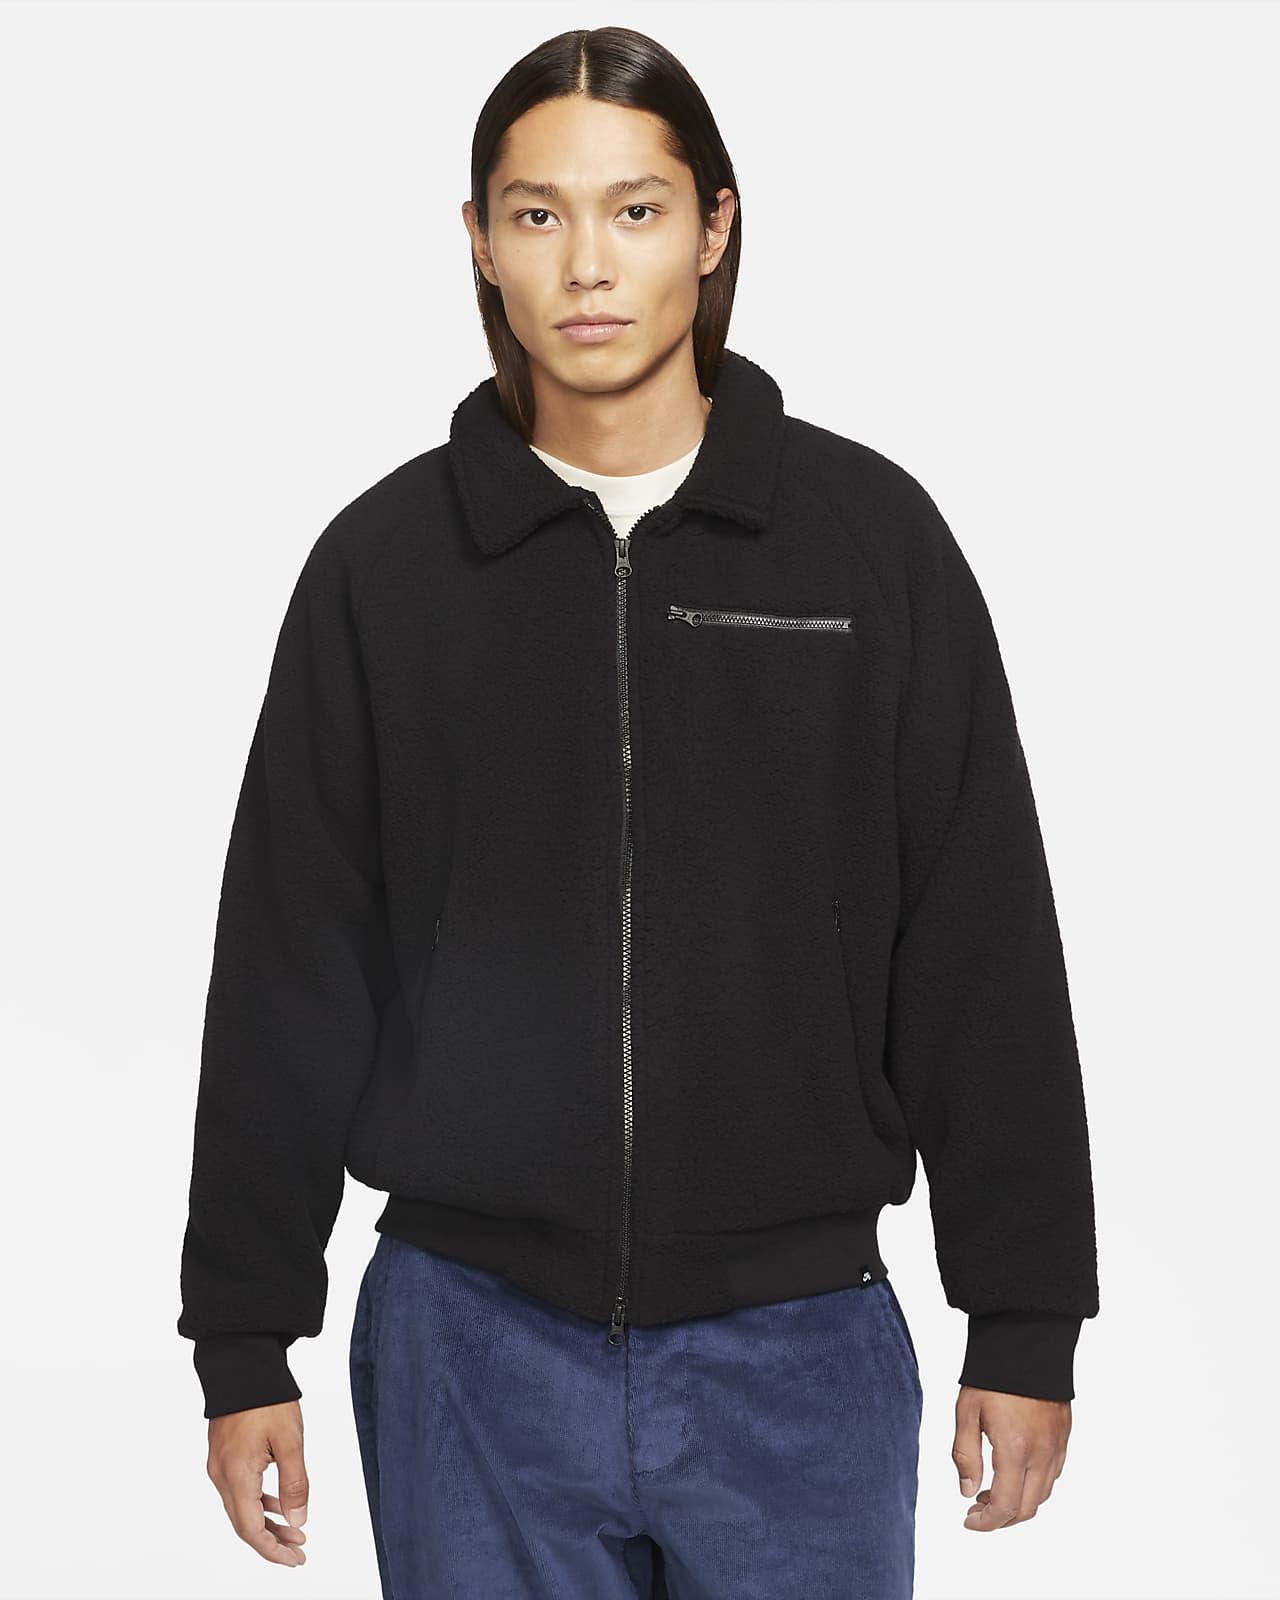 Nike SB Men's Sherpa Skate Jacket